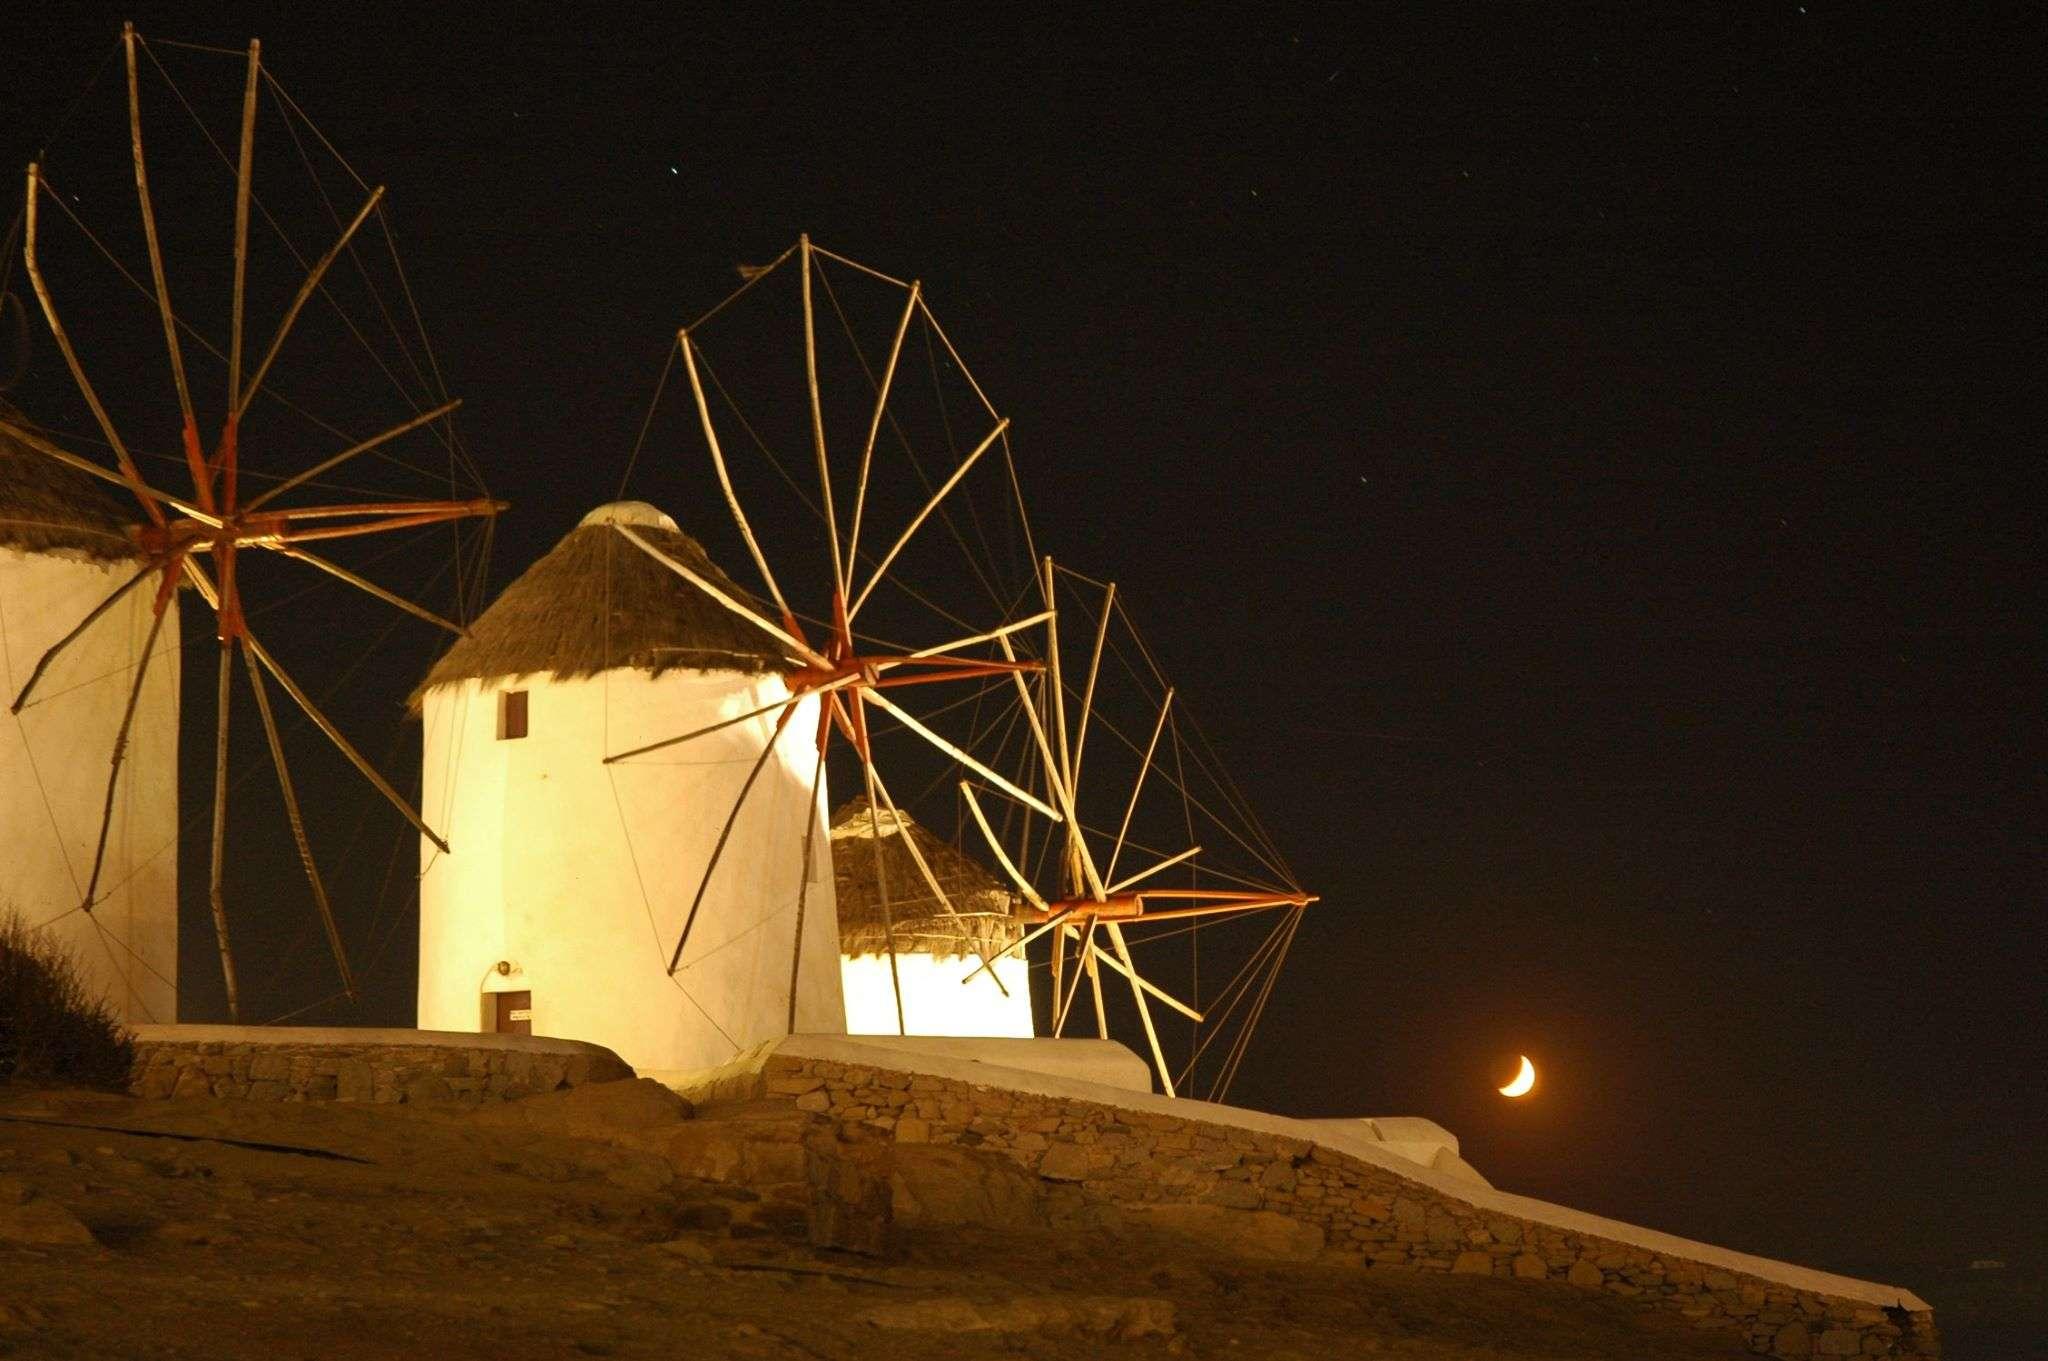 The windmills of Mykonos at night